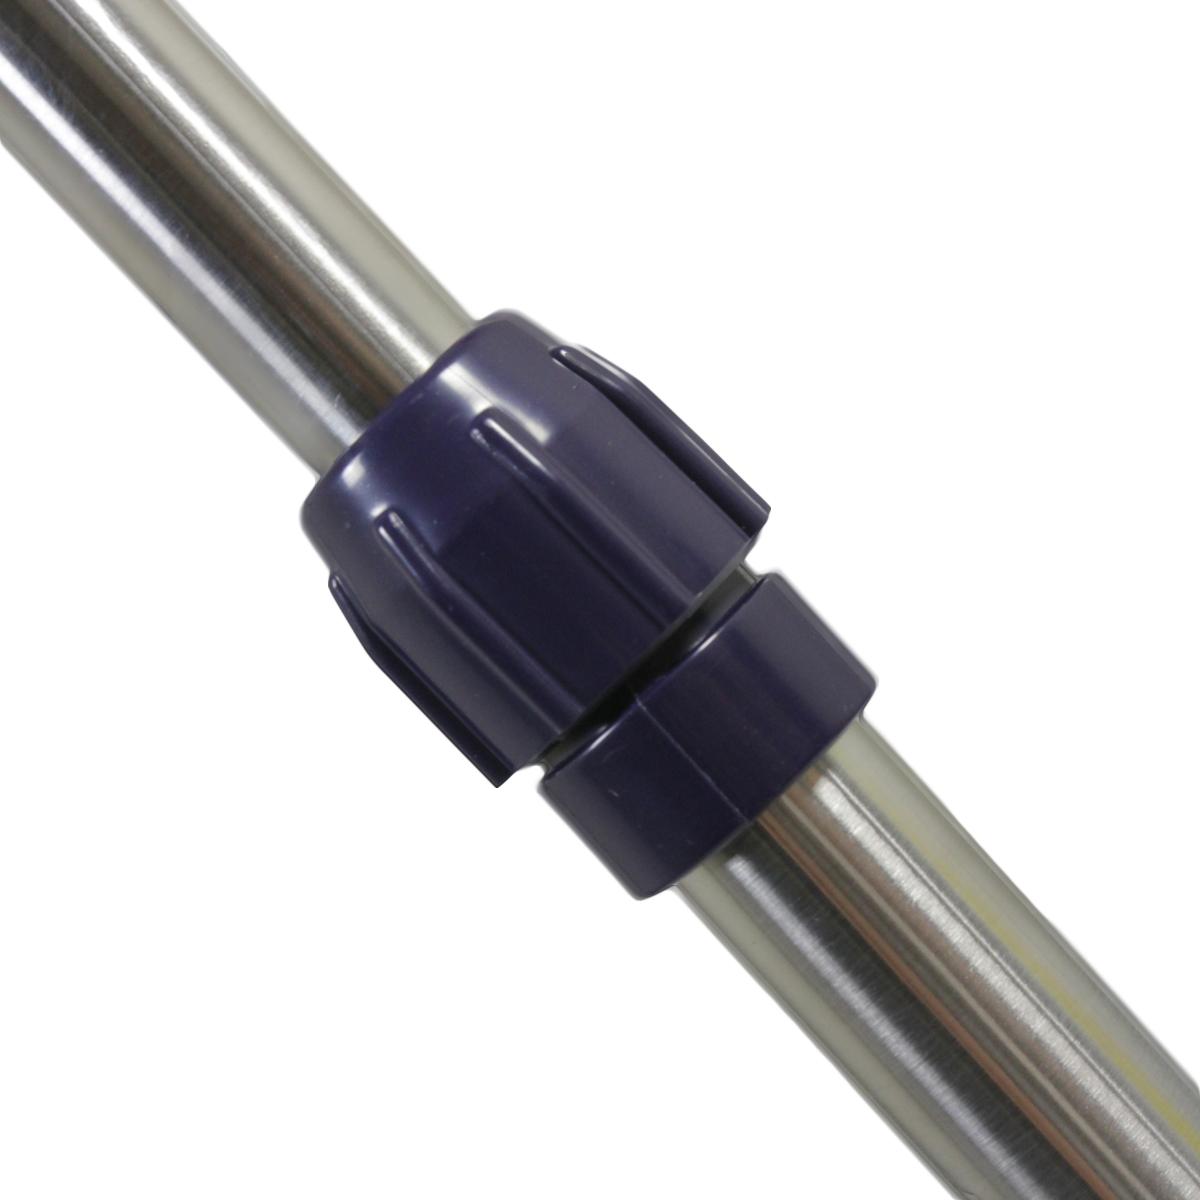 New Heavy Duty Double Rail Adjustable Telescopic Rolling